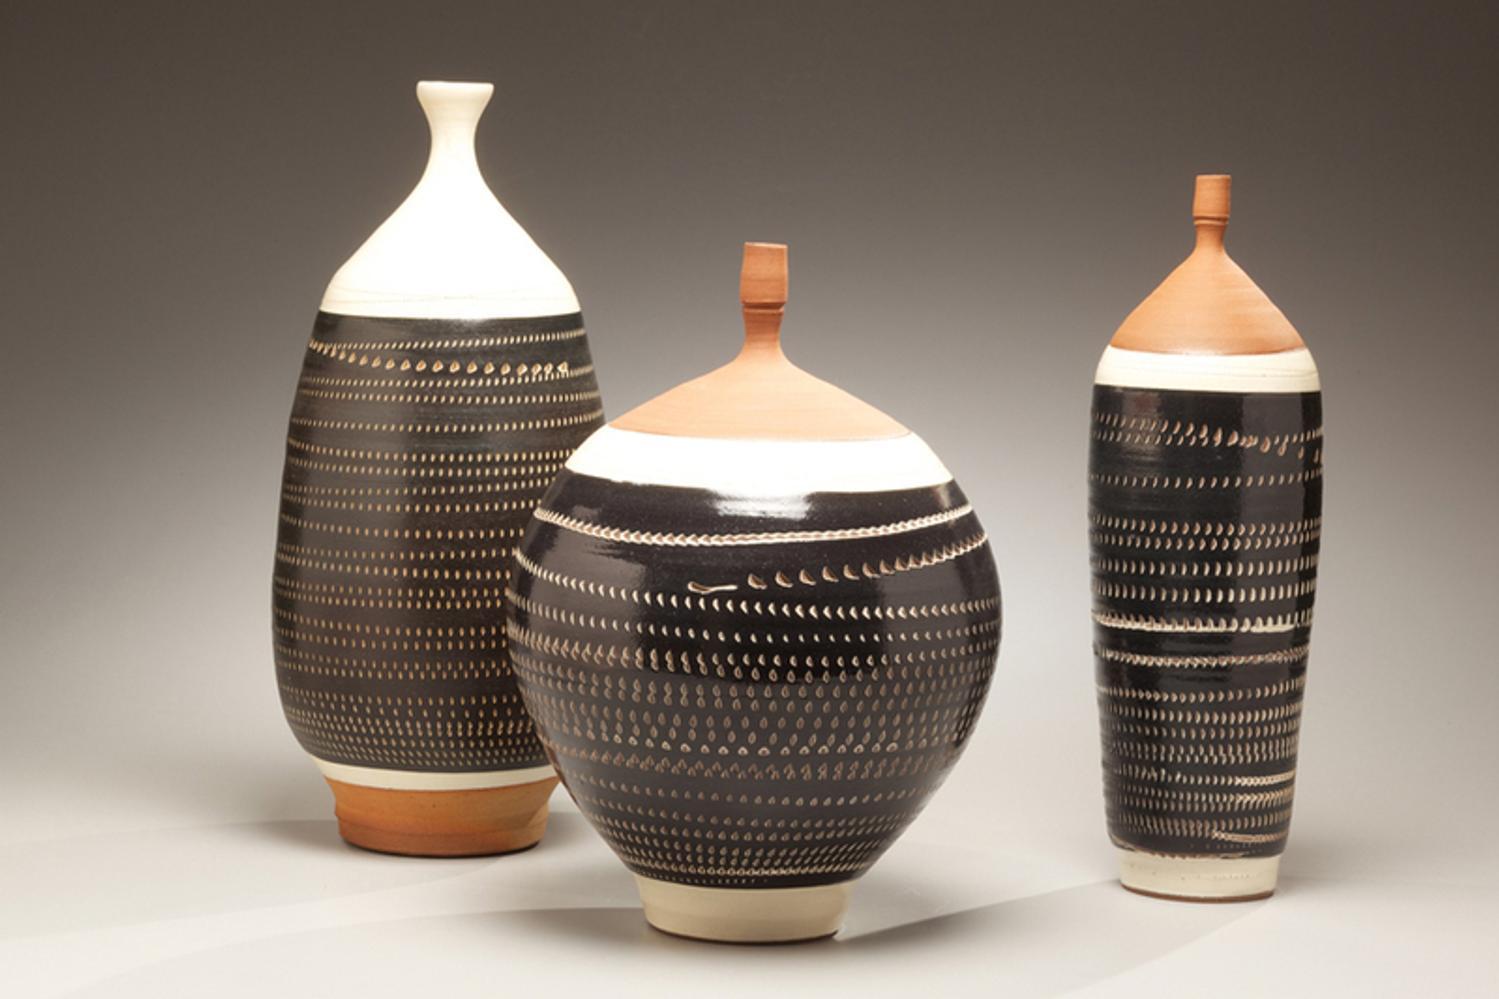 Trio of exhibitions illuminating post war japanese contemporary trio of exhibitions illuminating post war japanese contemporary ceramics at joan b mirviss ltd artfixdaily news feed reviewsmspy